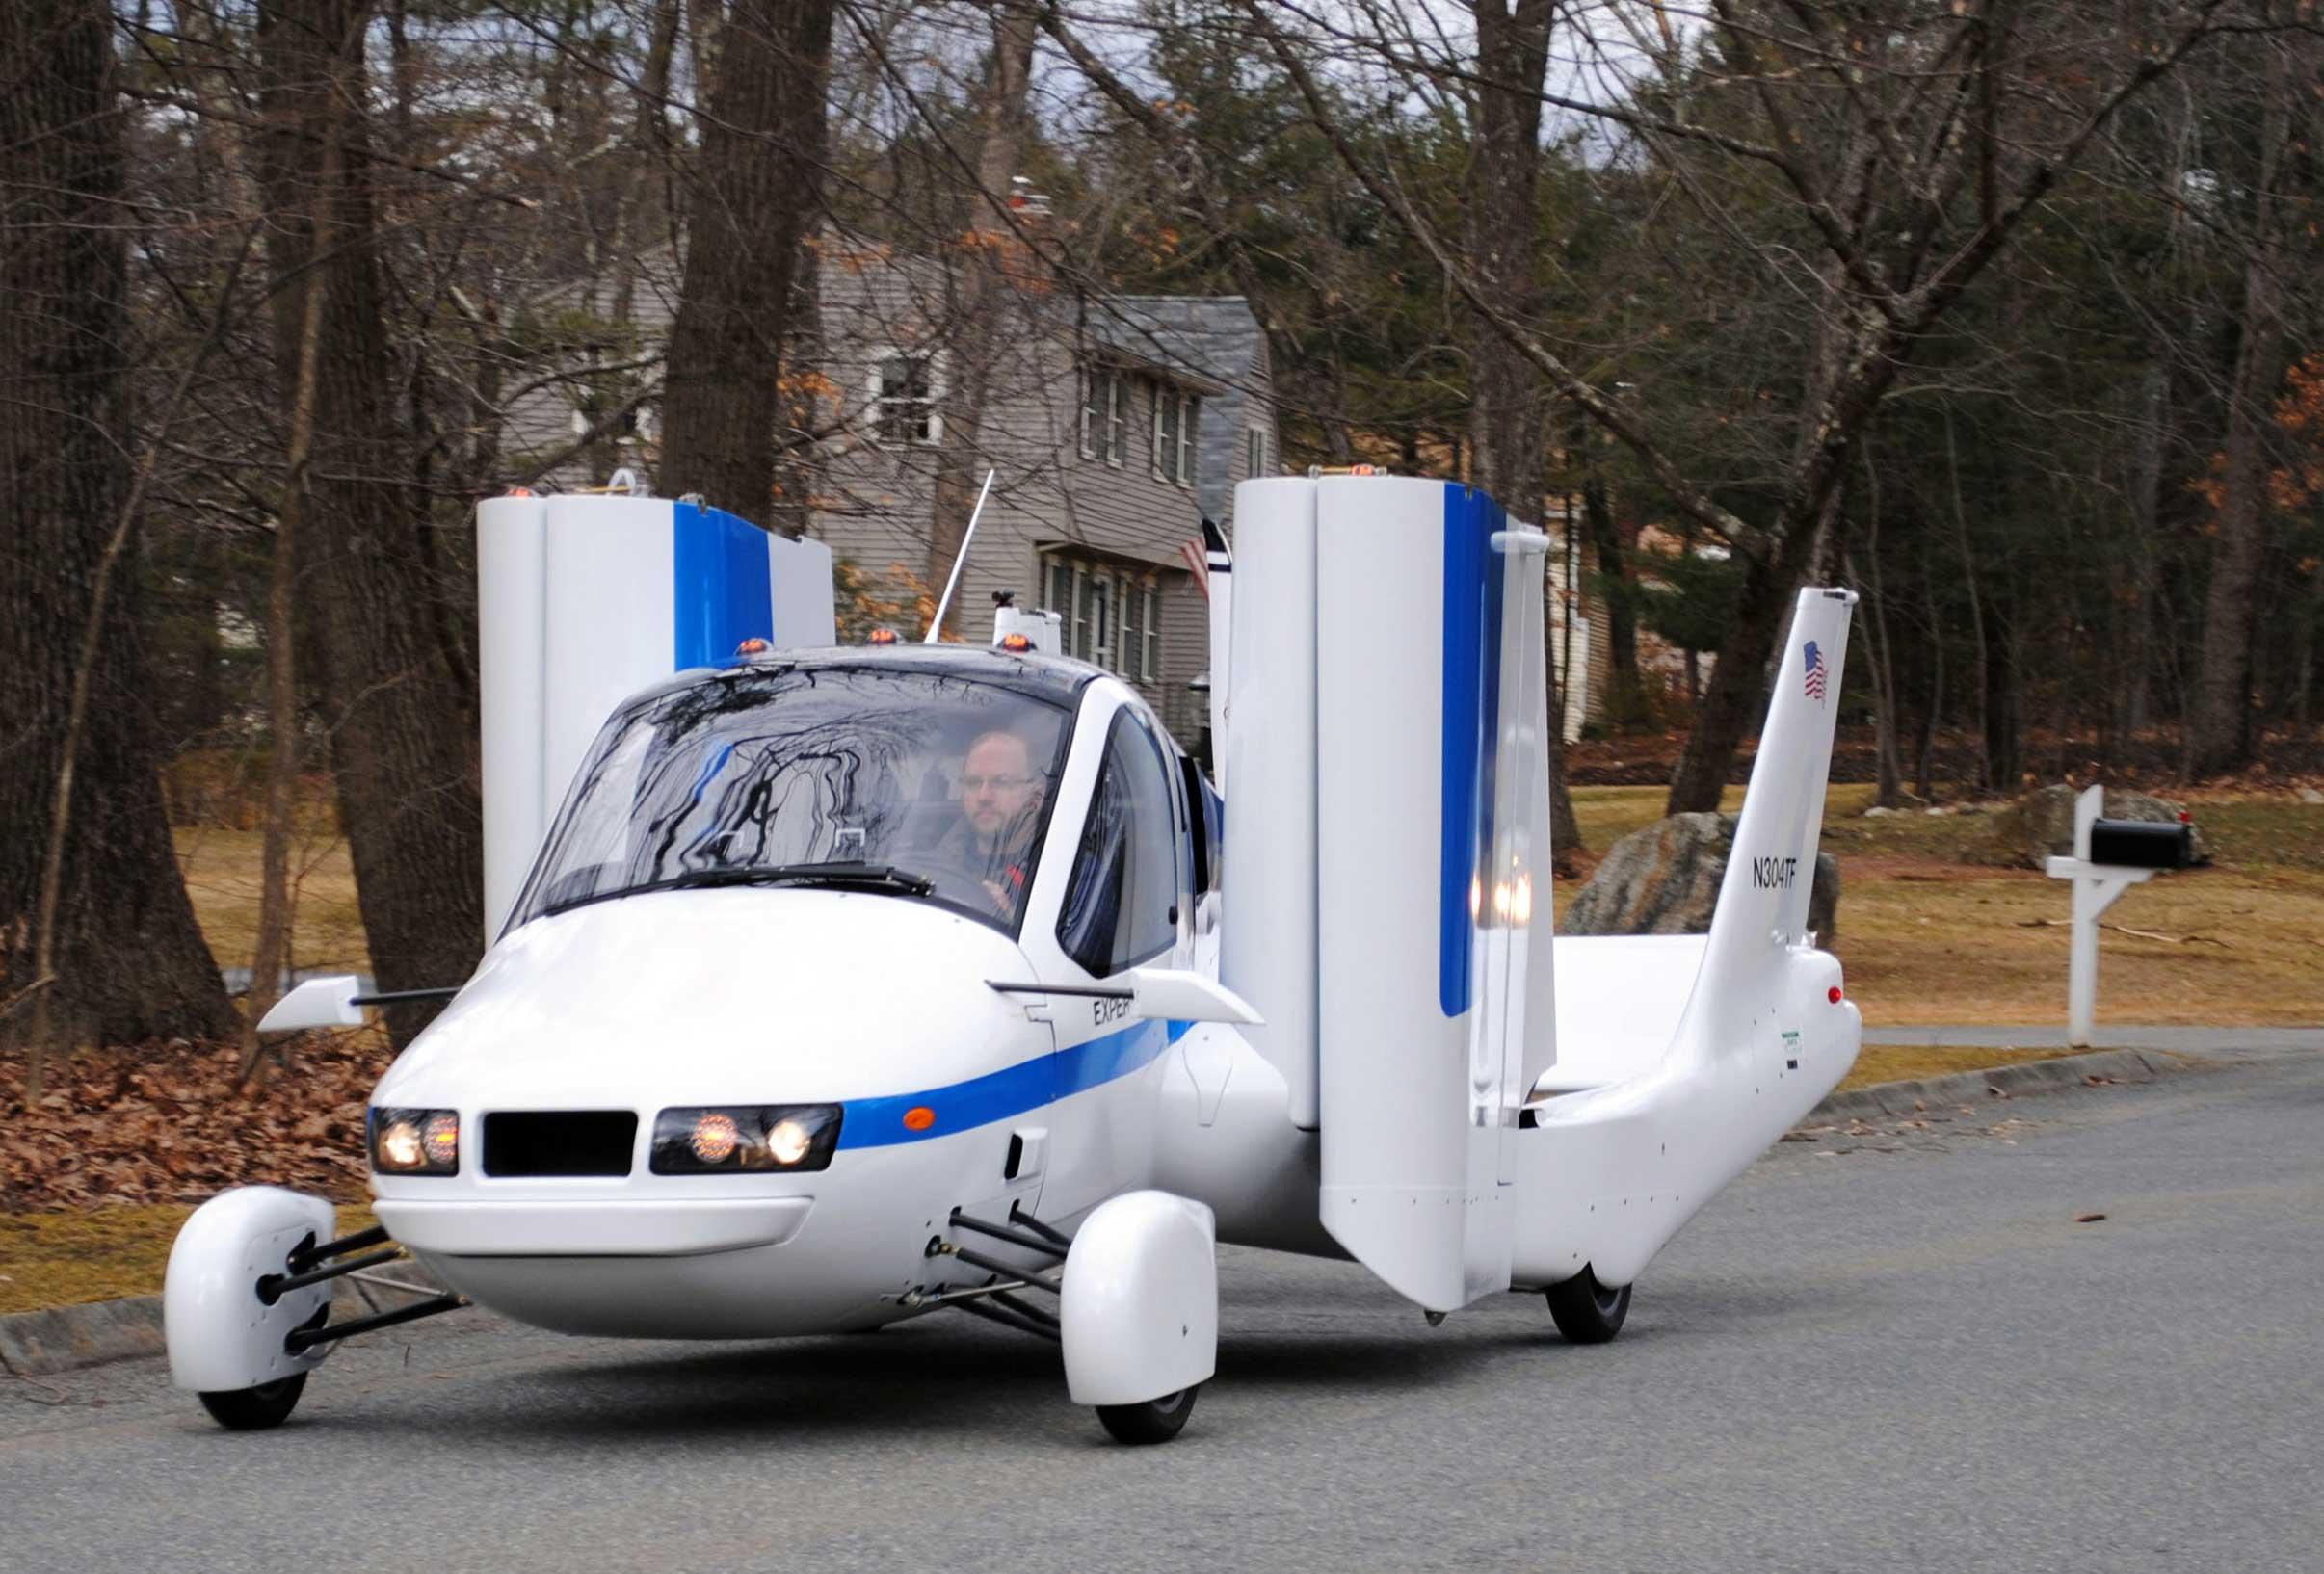 Weight increase for Terrafugia flying car - FLYER